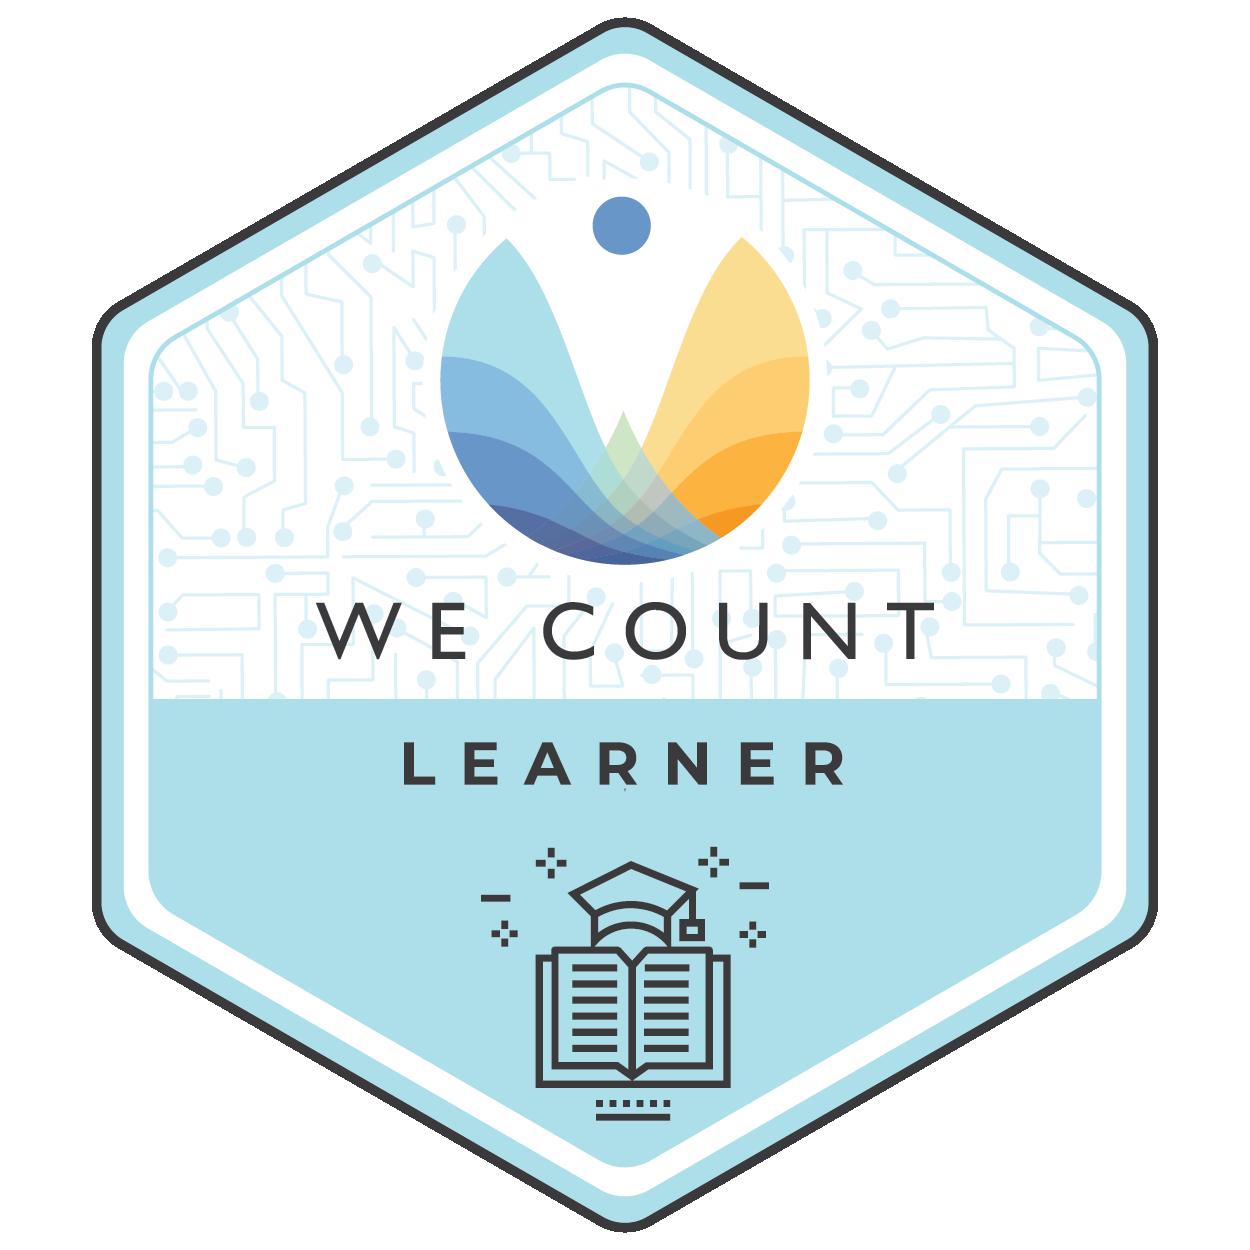 LEARNER: Bias in Machine Learning